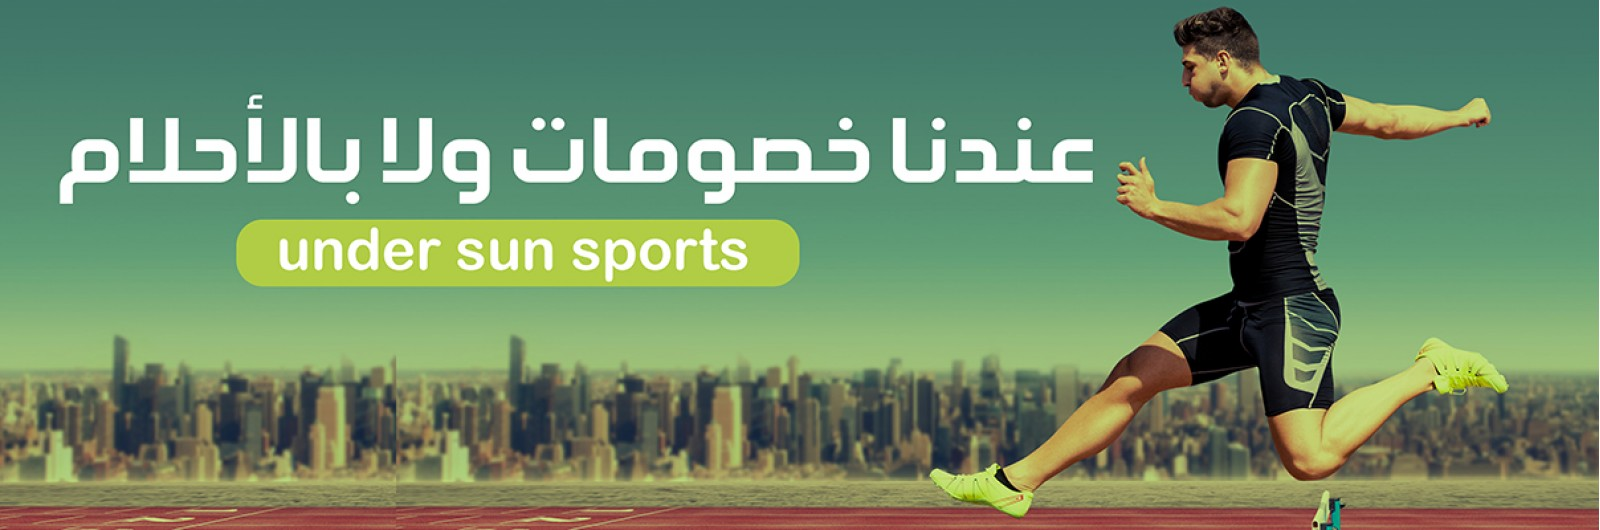 Under Sun Sports